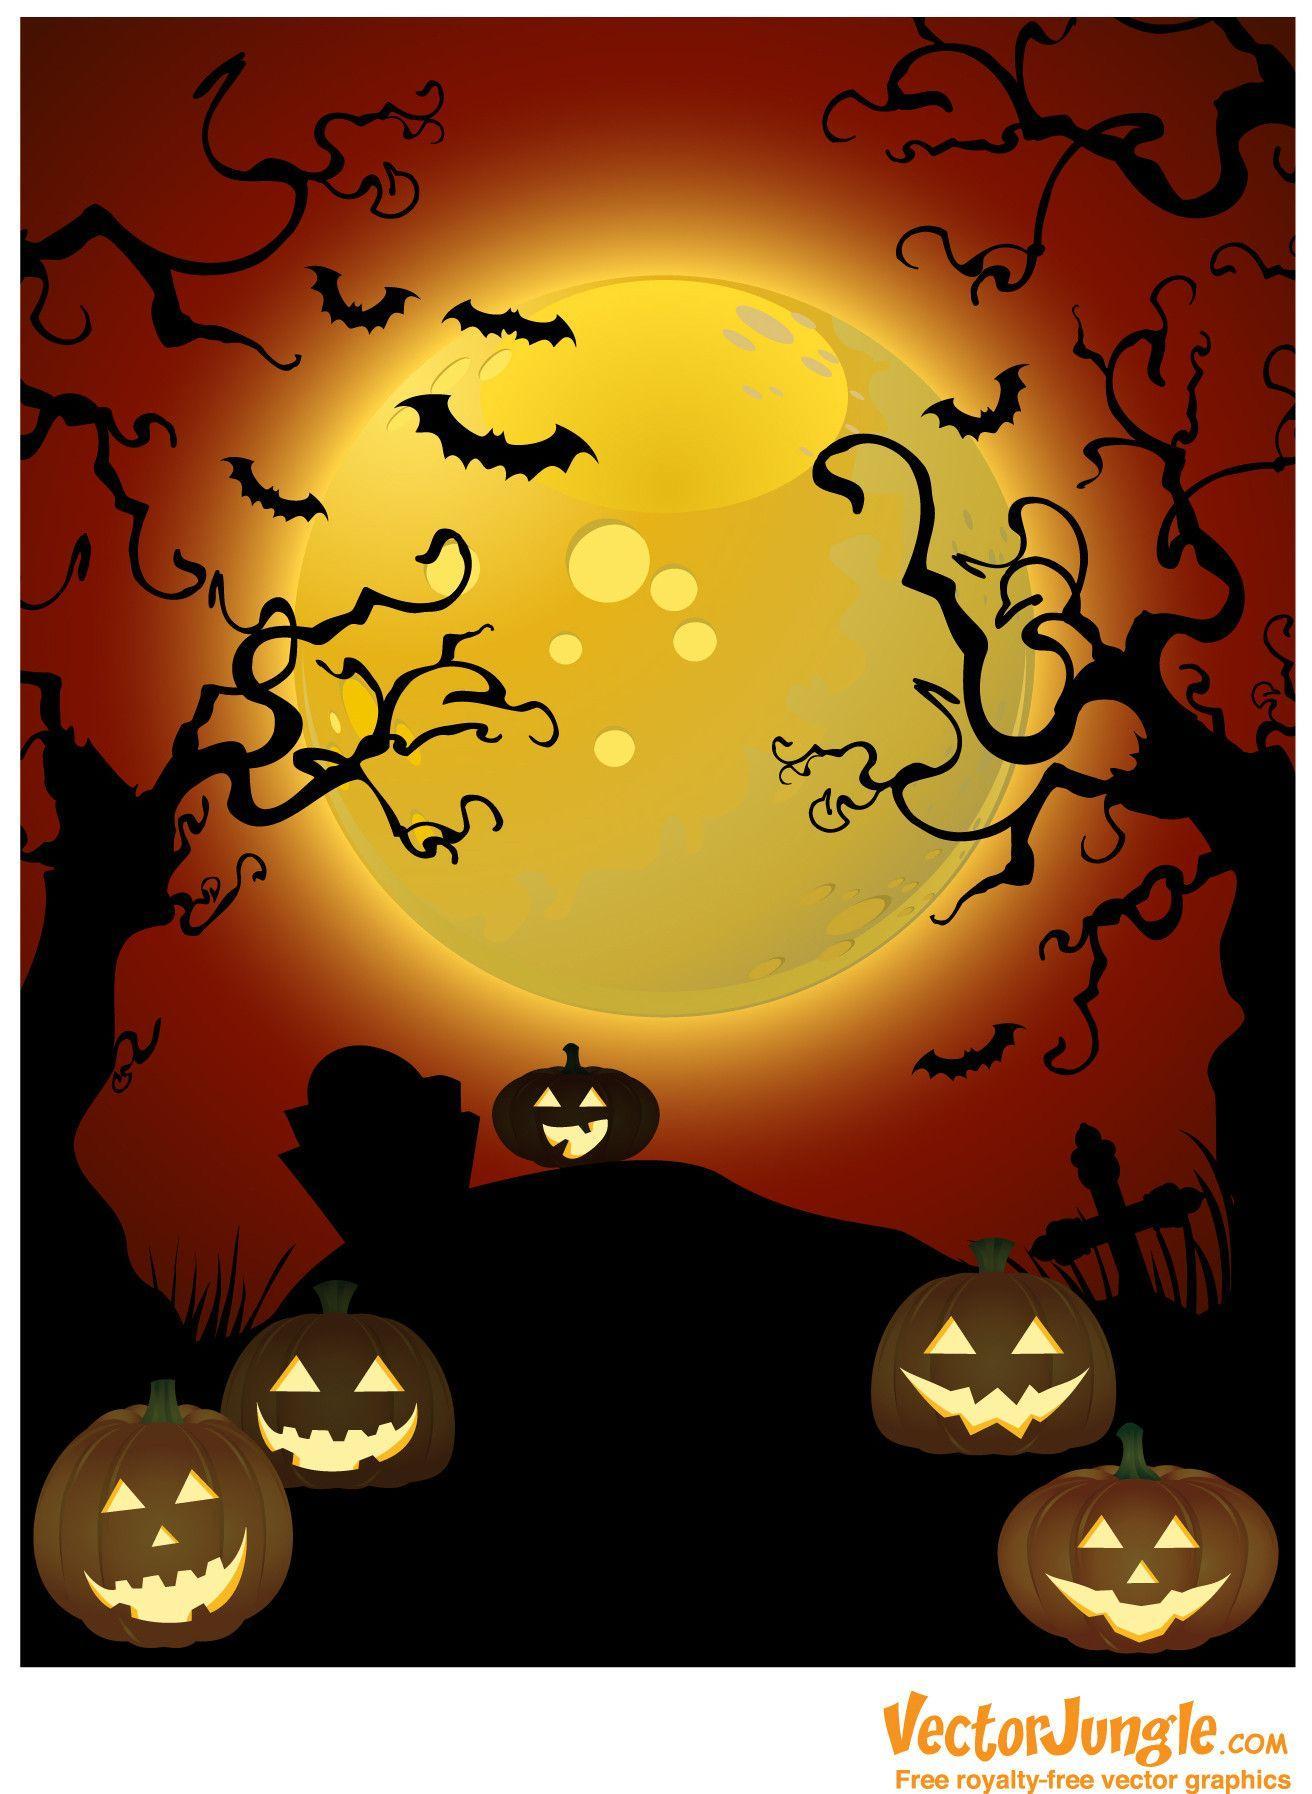 free vector halloween clipart - photo #15